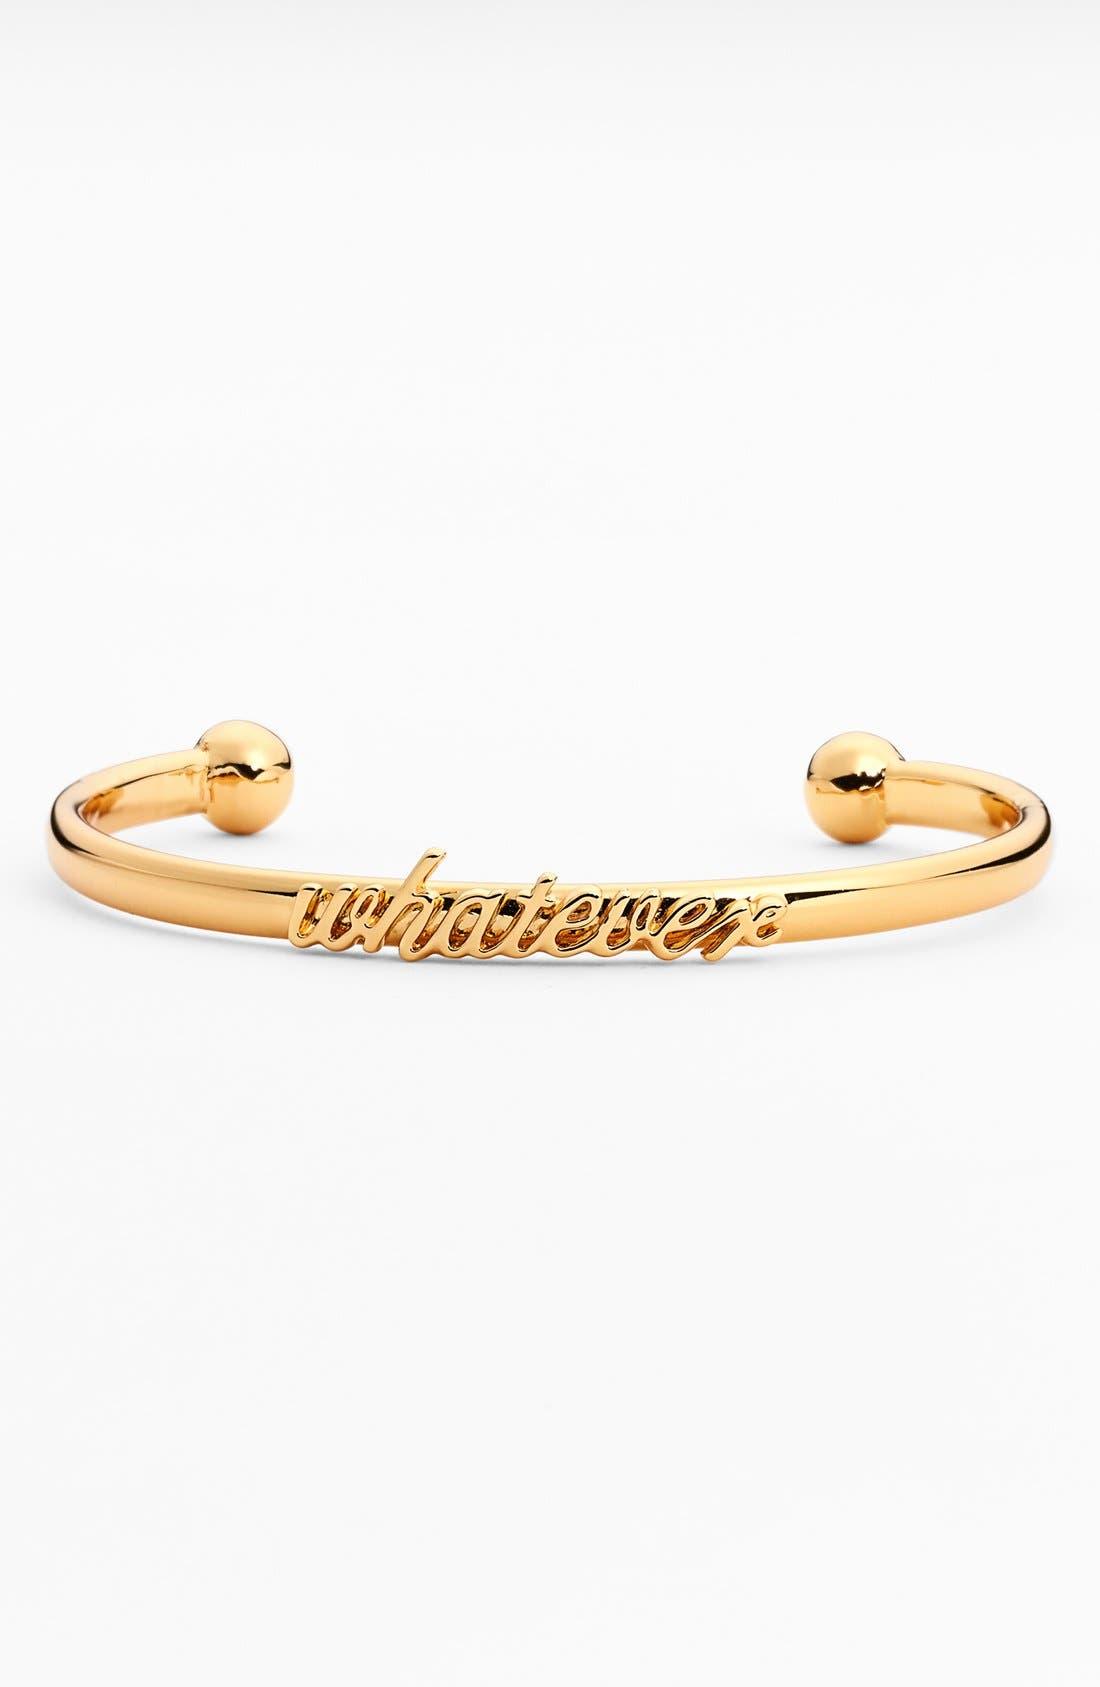 Main Image - kate spade new york 'whatever' script cuff bracelet